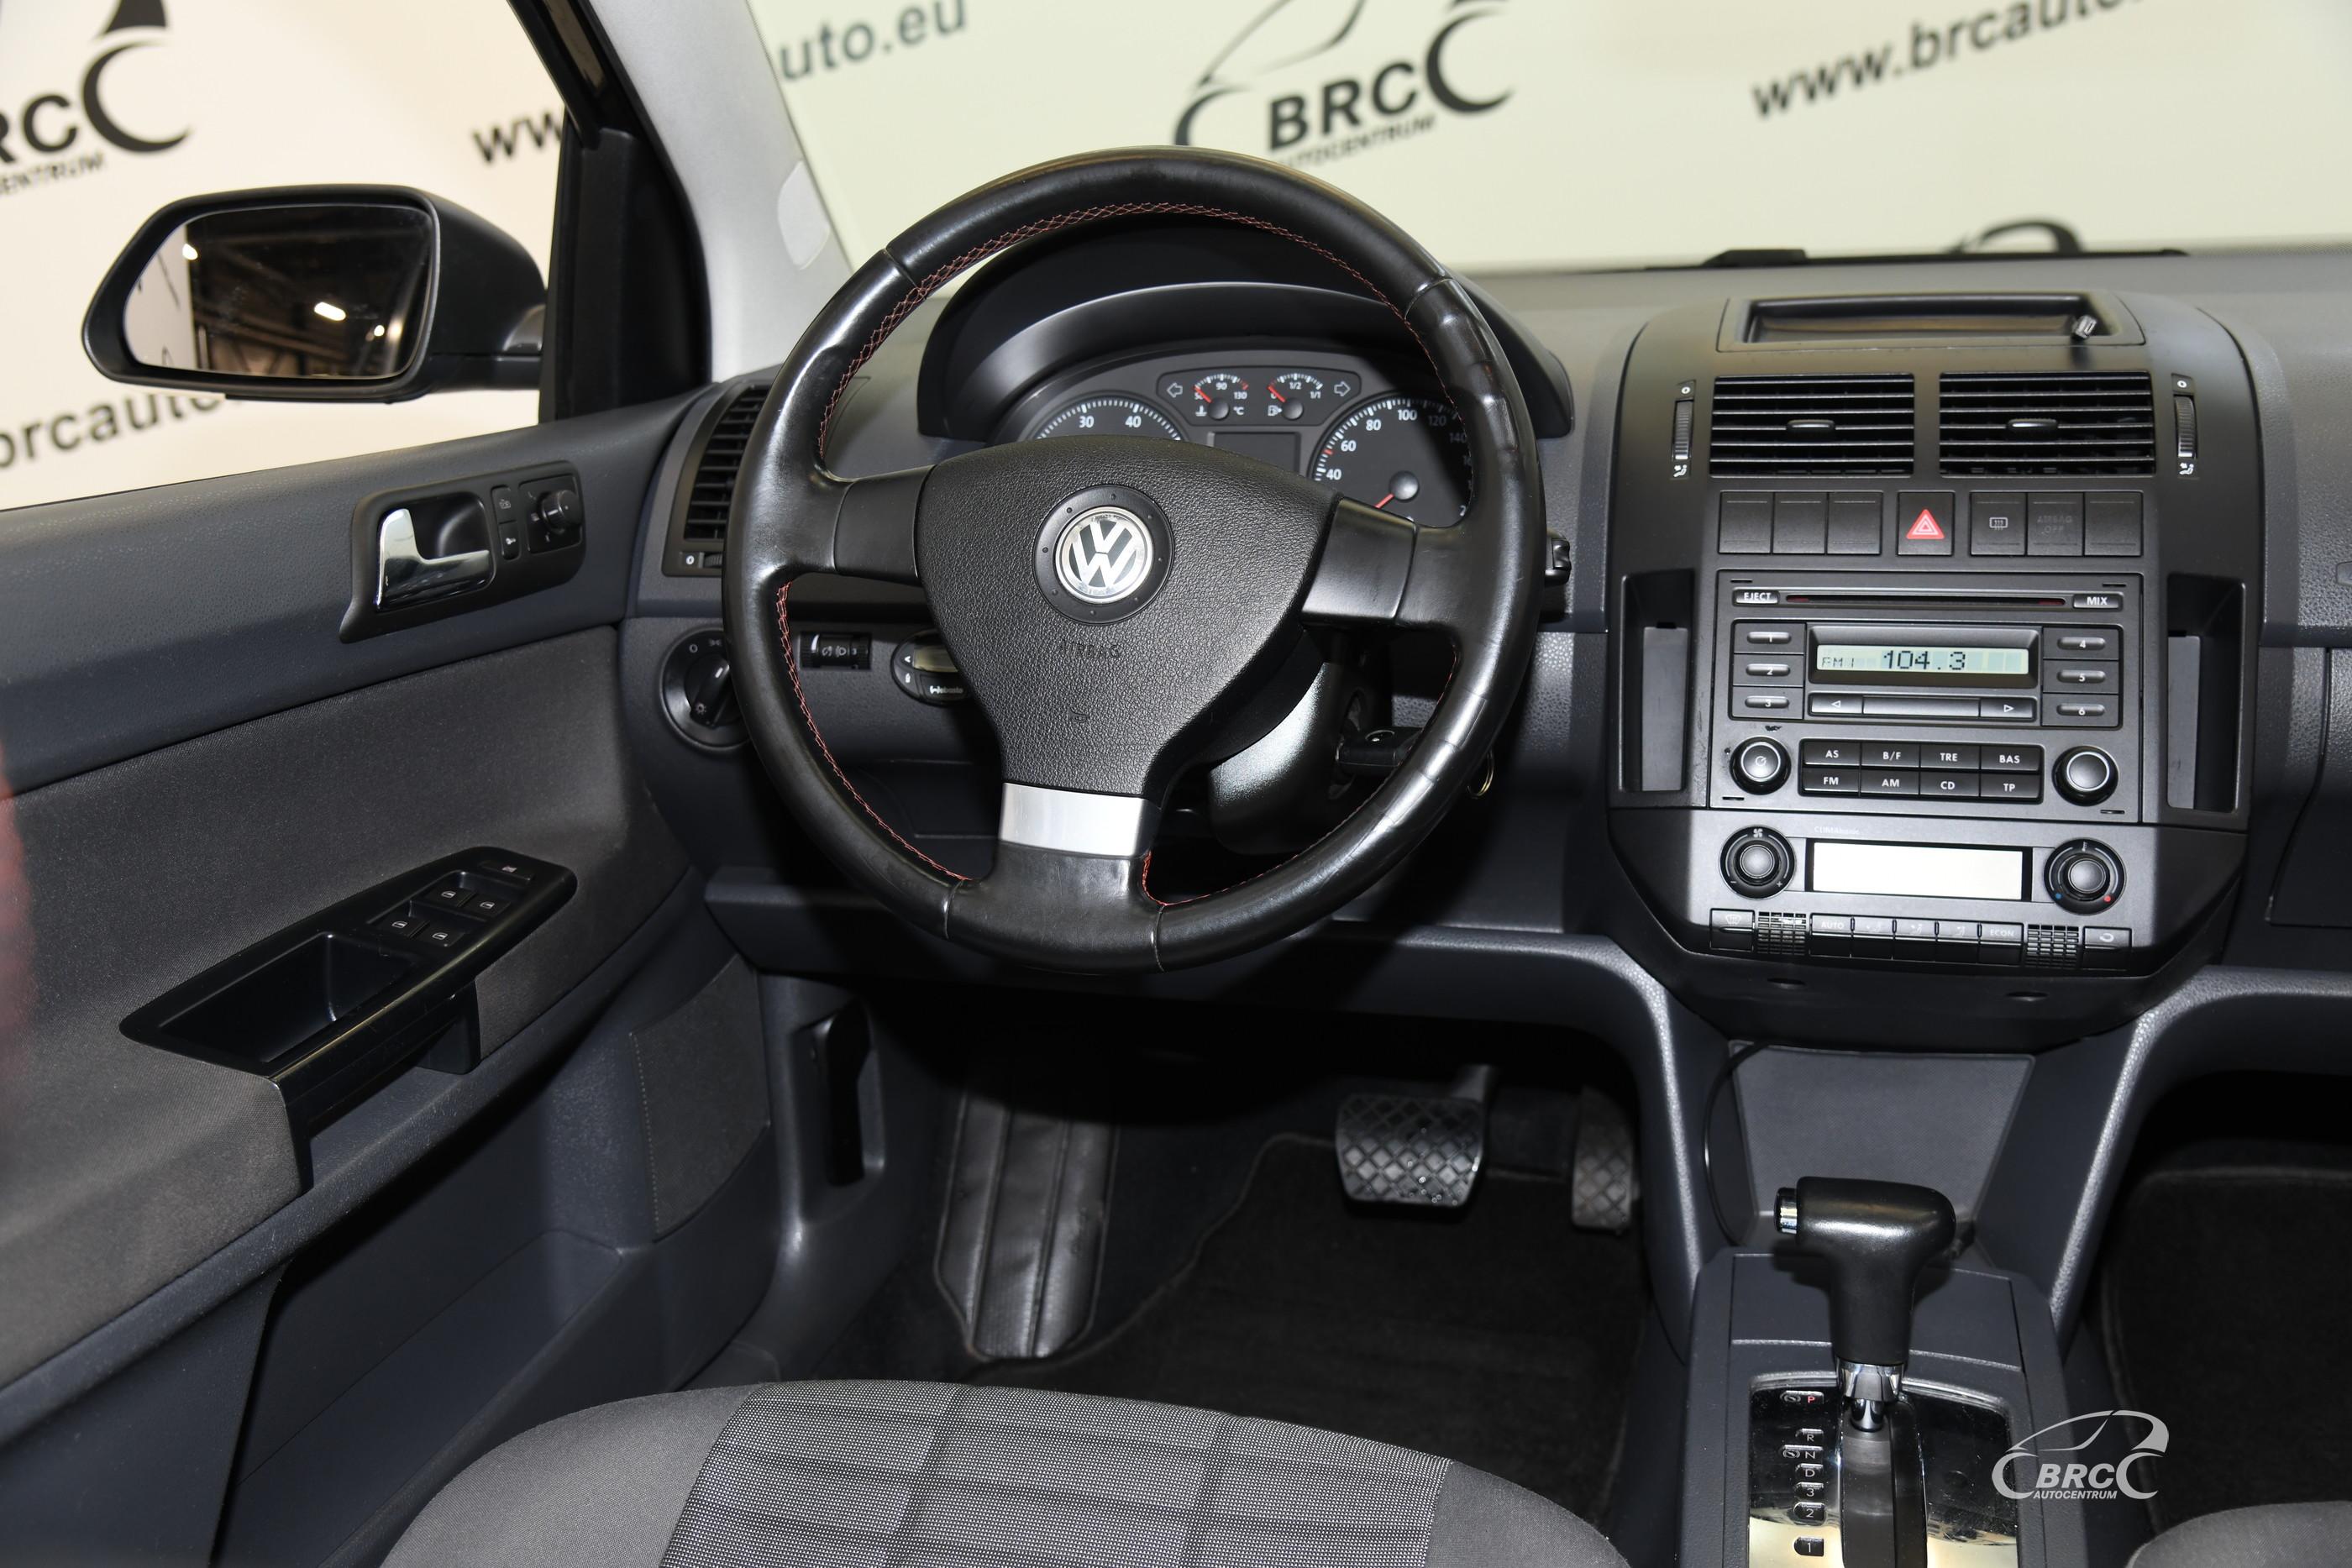 Volkswagen Polo 1.4 Goal Automatas